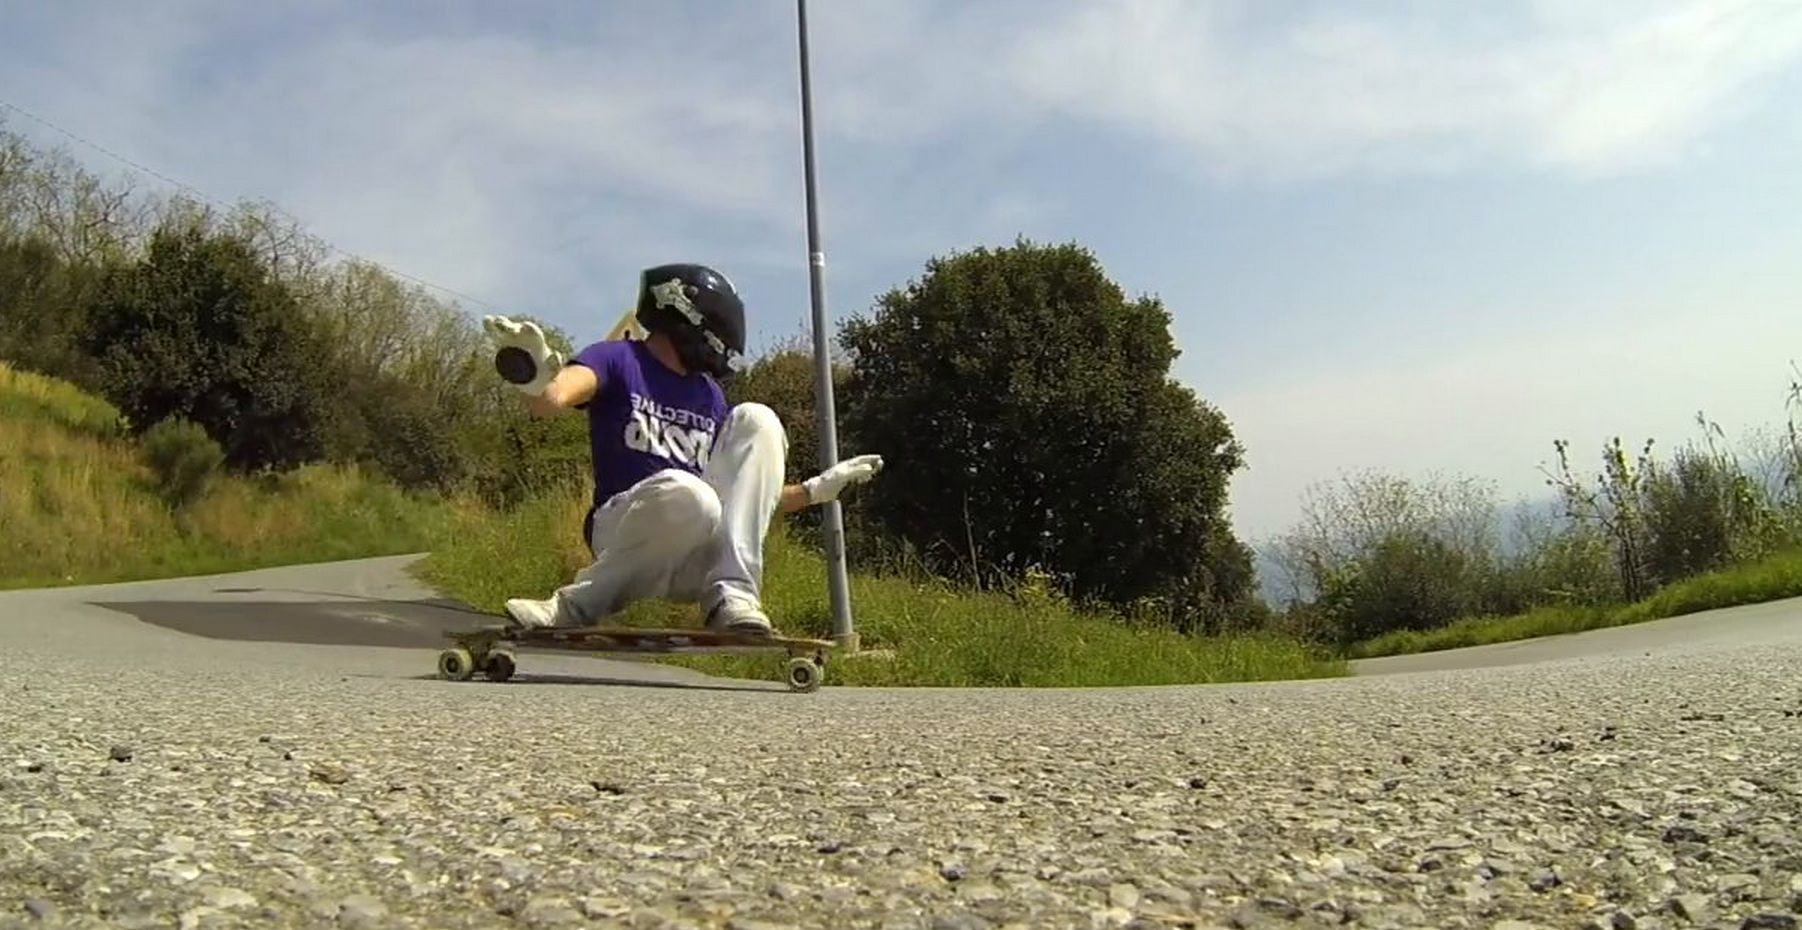 AL1 #049 Longskate Downhill